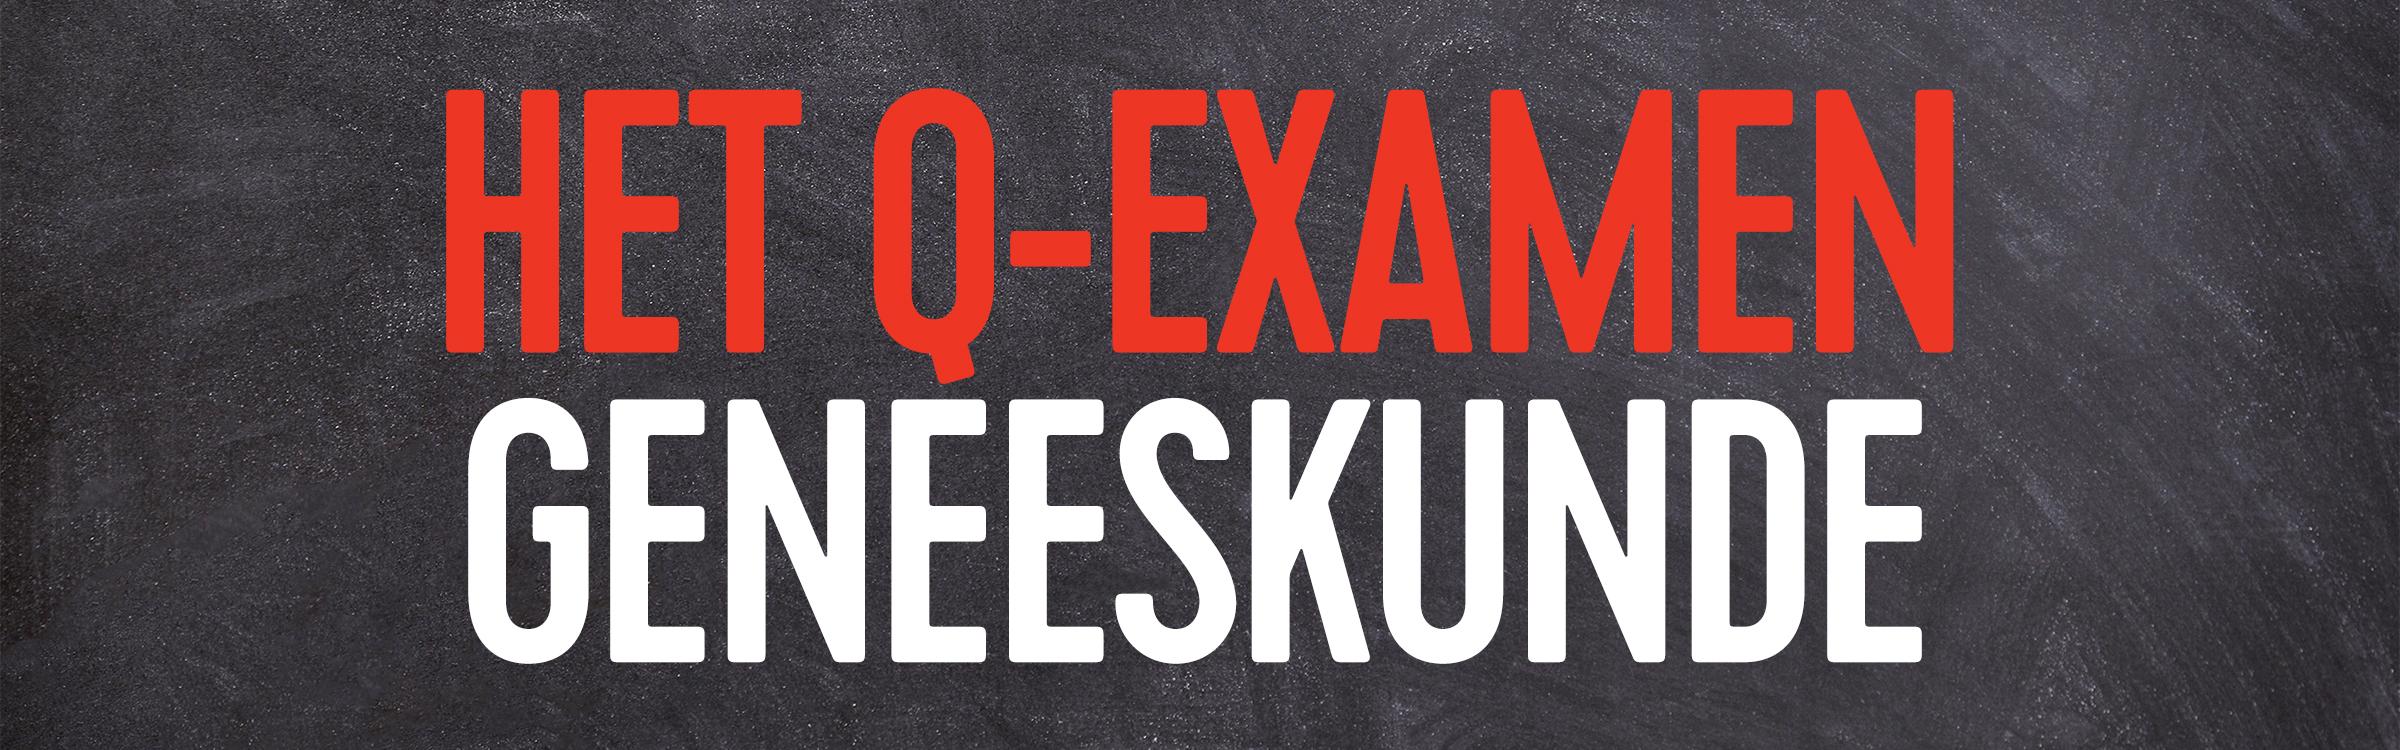 Q examen geneeskunde header